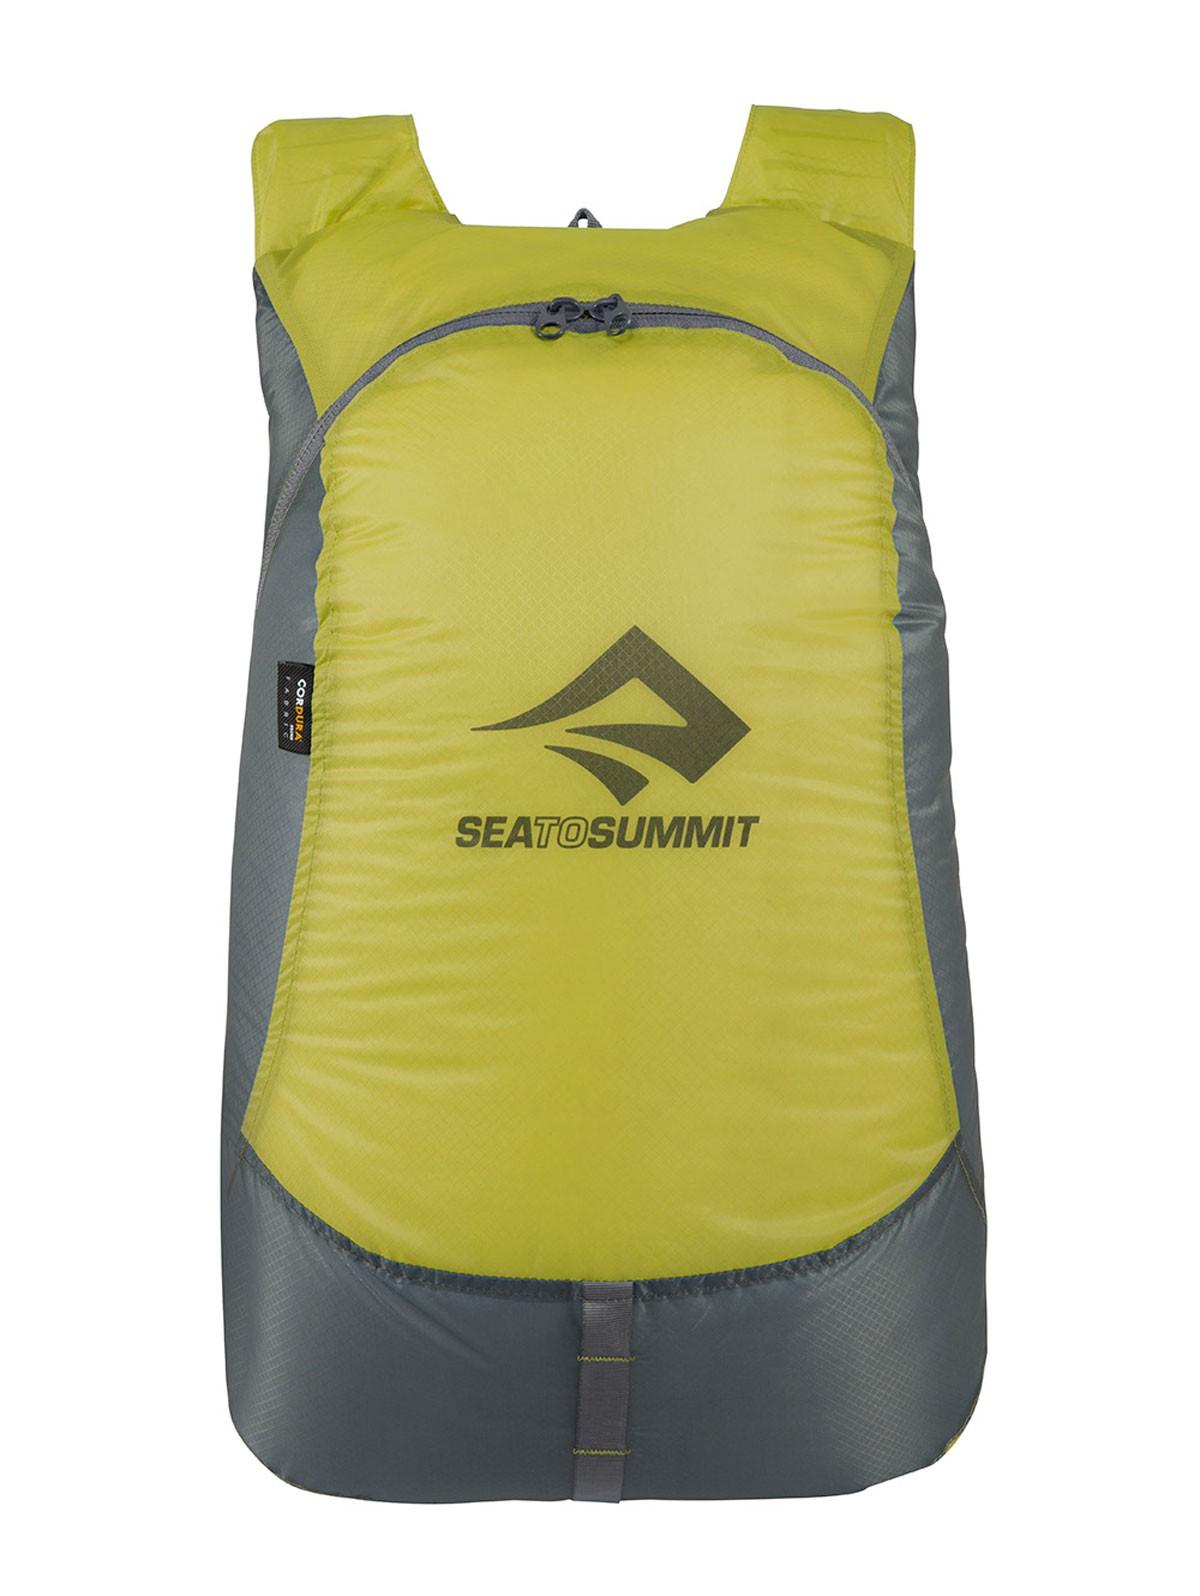 Mochila Sea To Summit Ultra Sil Daypack 20 Litros